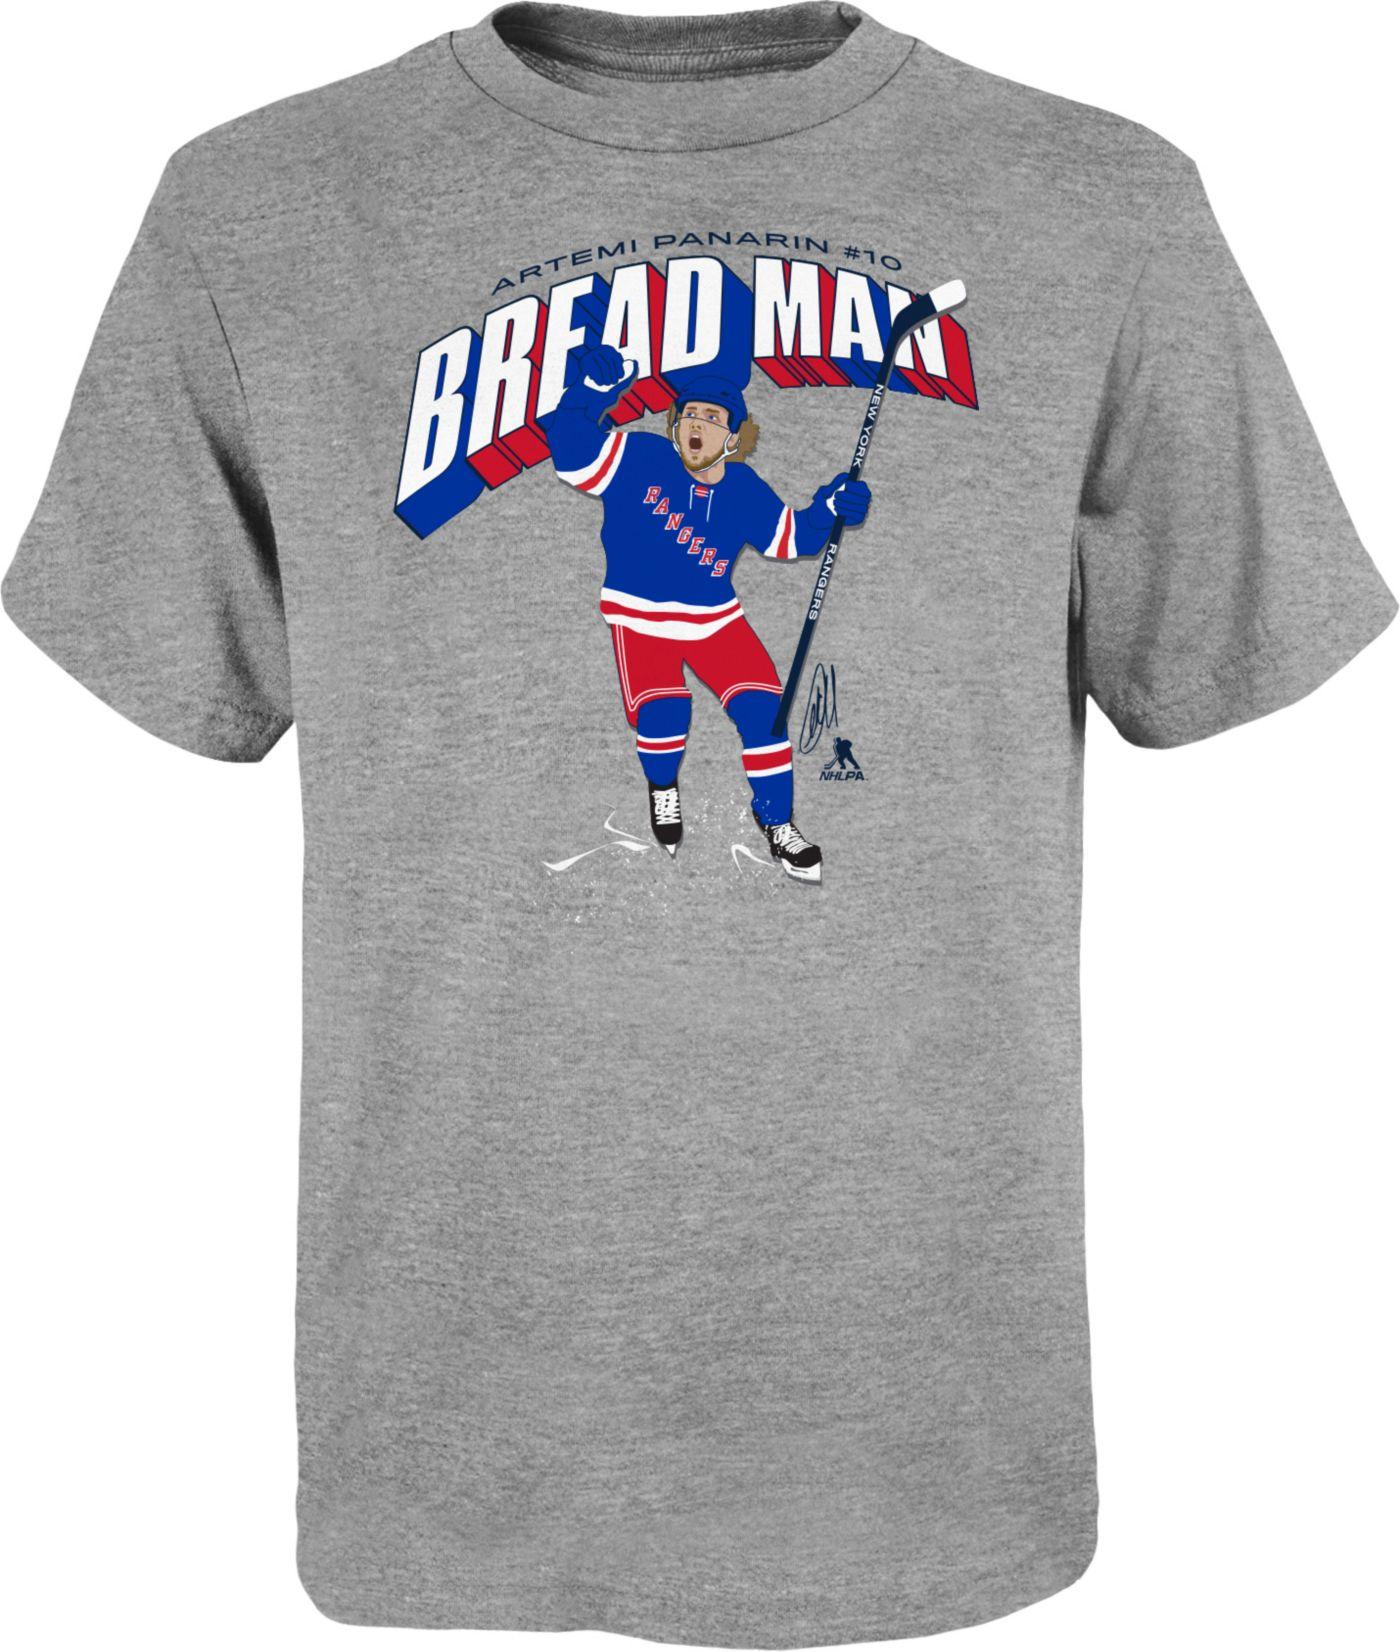 NHL Youth New York Rangers Artemi Panarin #10 Breadman Heather Grey T-Shirt